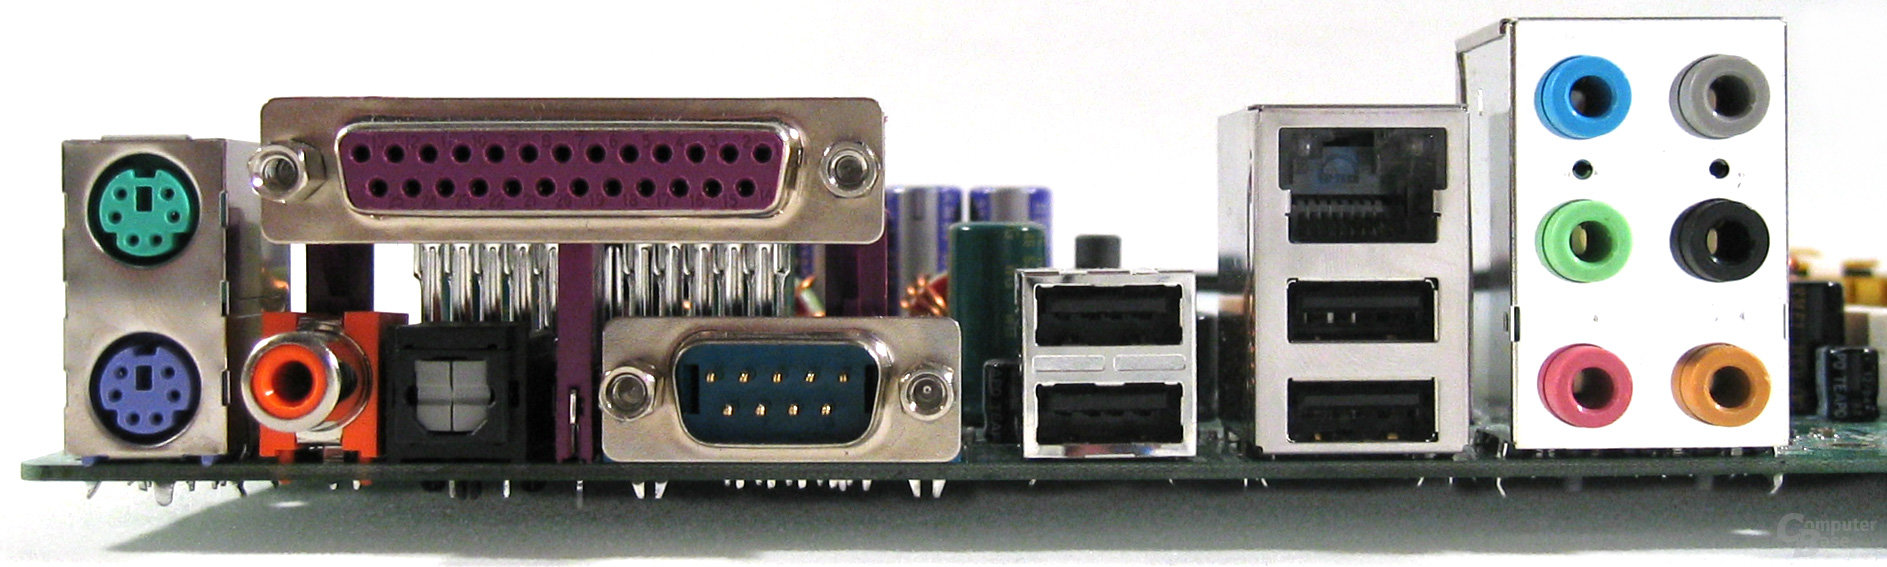 EPoX 9NPA+ Ultra ATX-Blende